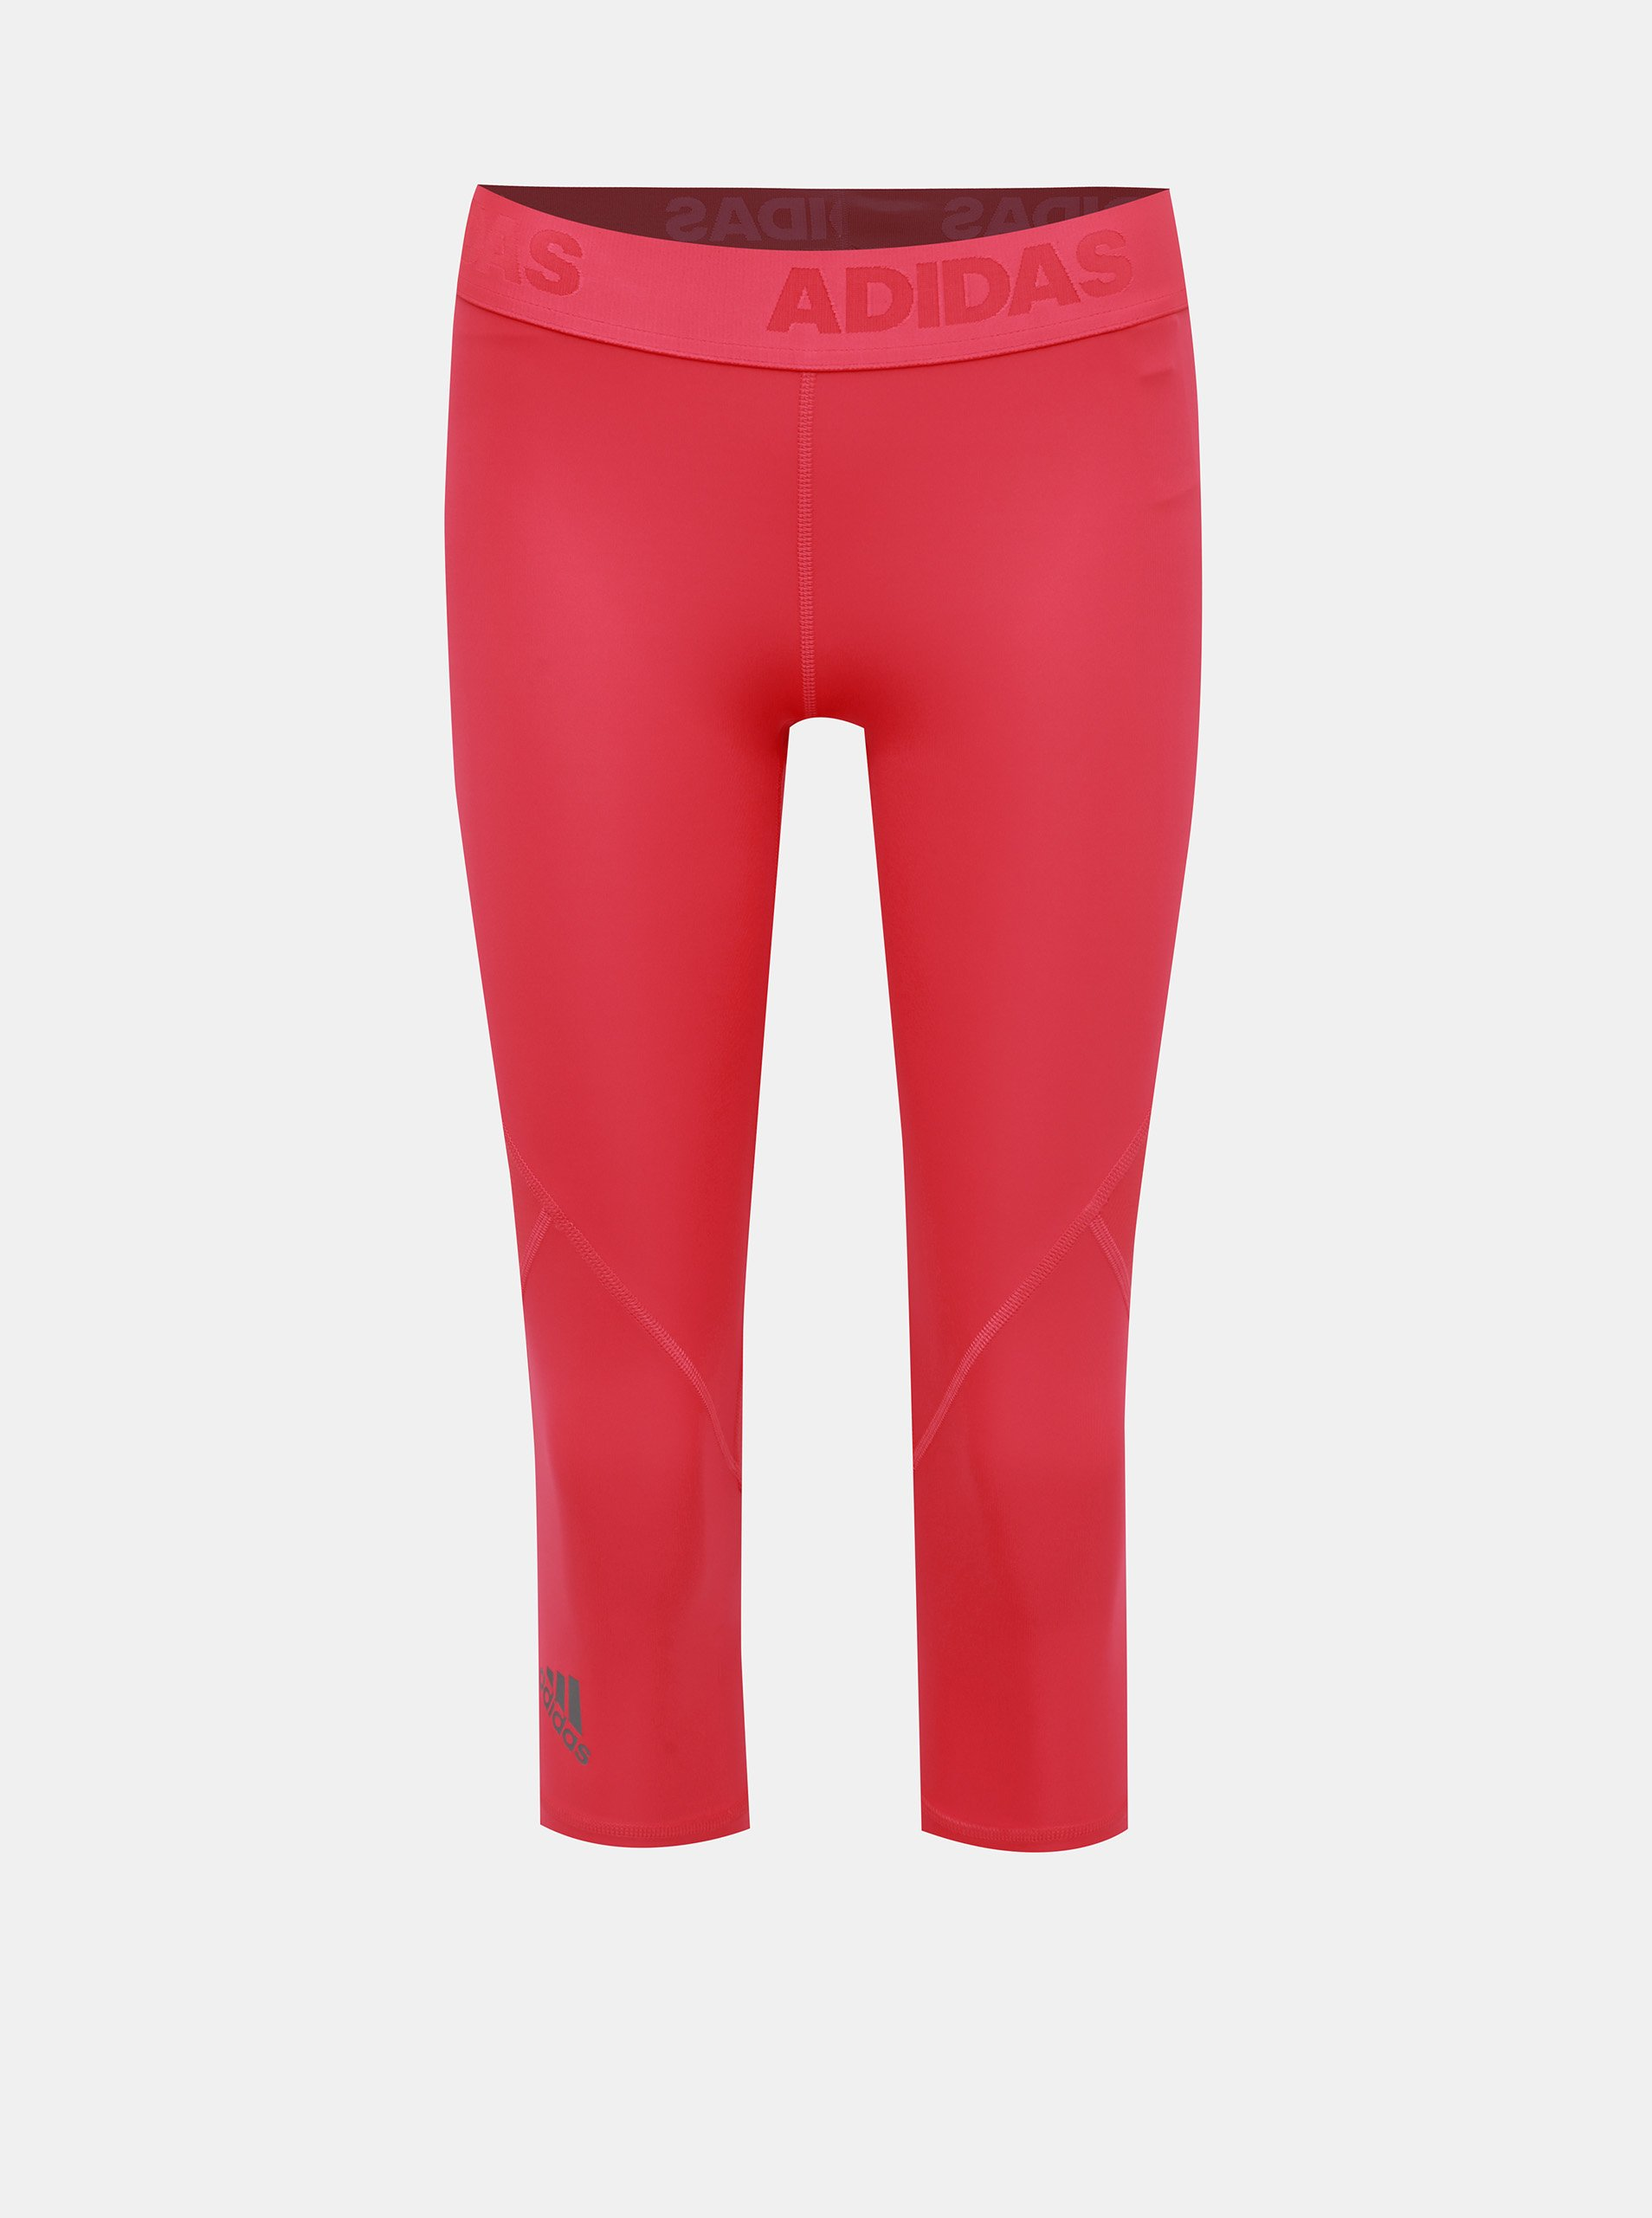 Rúžové dámske legíny adidas Performance